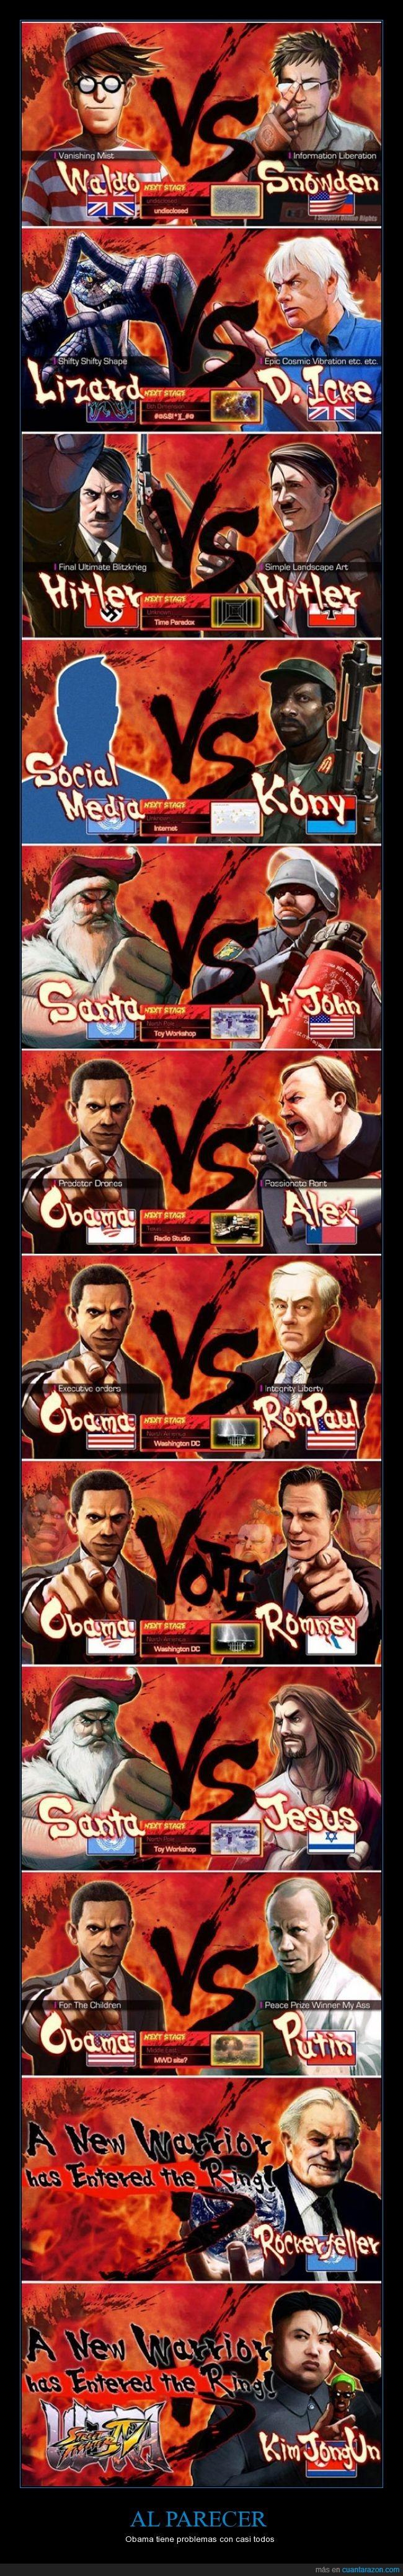 Kony,lucha,obama,presentacion,putin,Real world fighter,Street Fighter,y Ghandi donde carajo a esta Ghandi